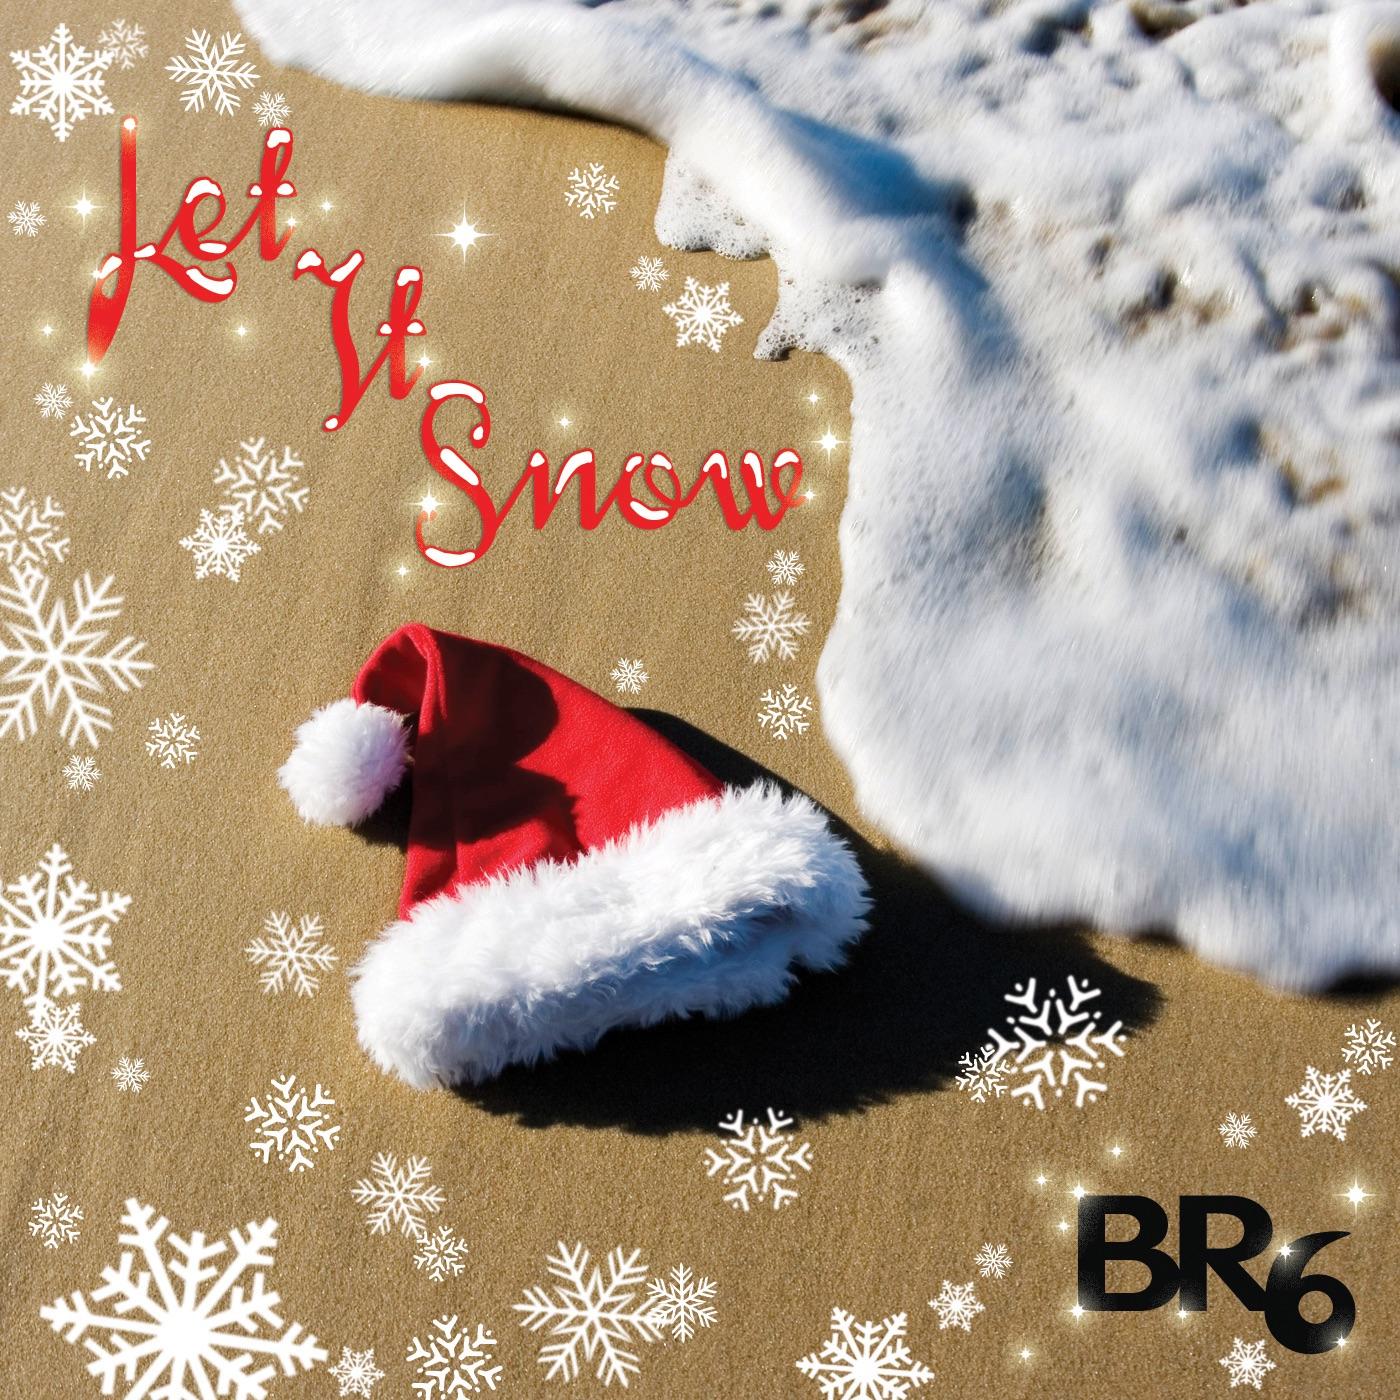 Let It Snow - Single